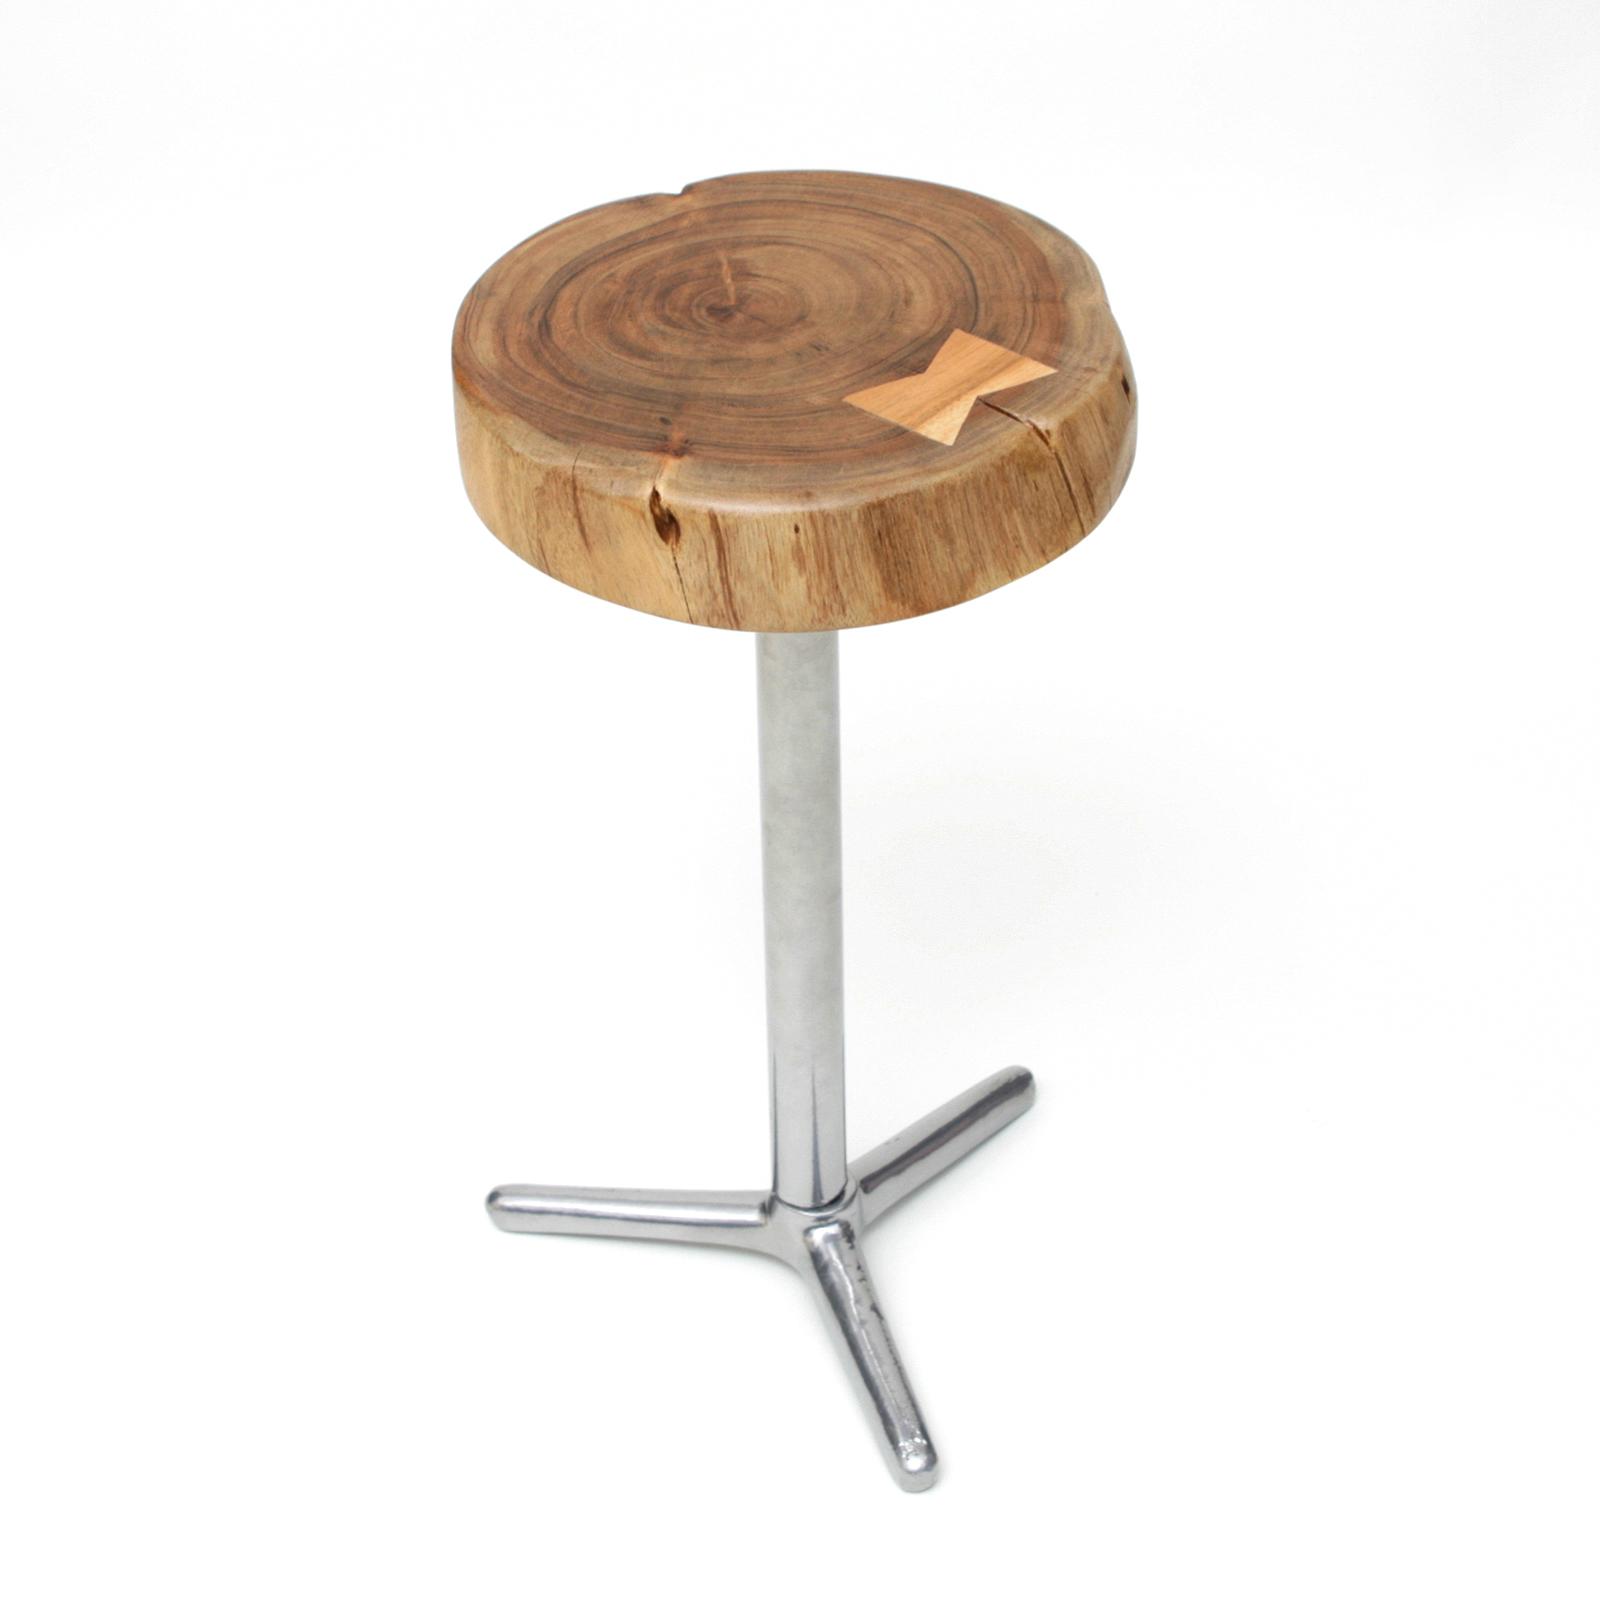 hocker sitz beistelltisch stuhl holz metall stahl. Black Bedroom Furniture Sets. Home Design Ideas